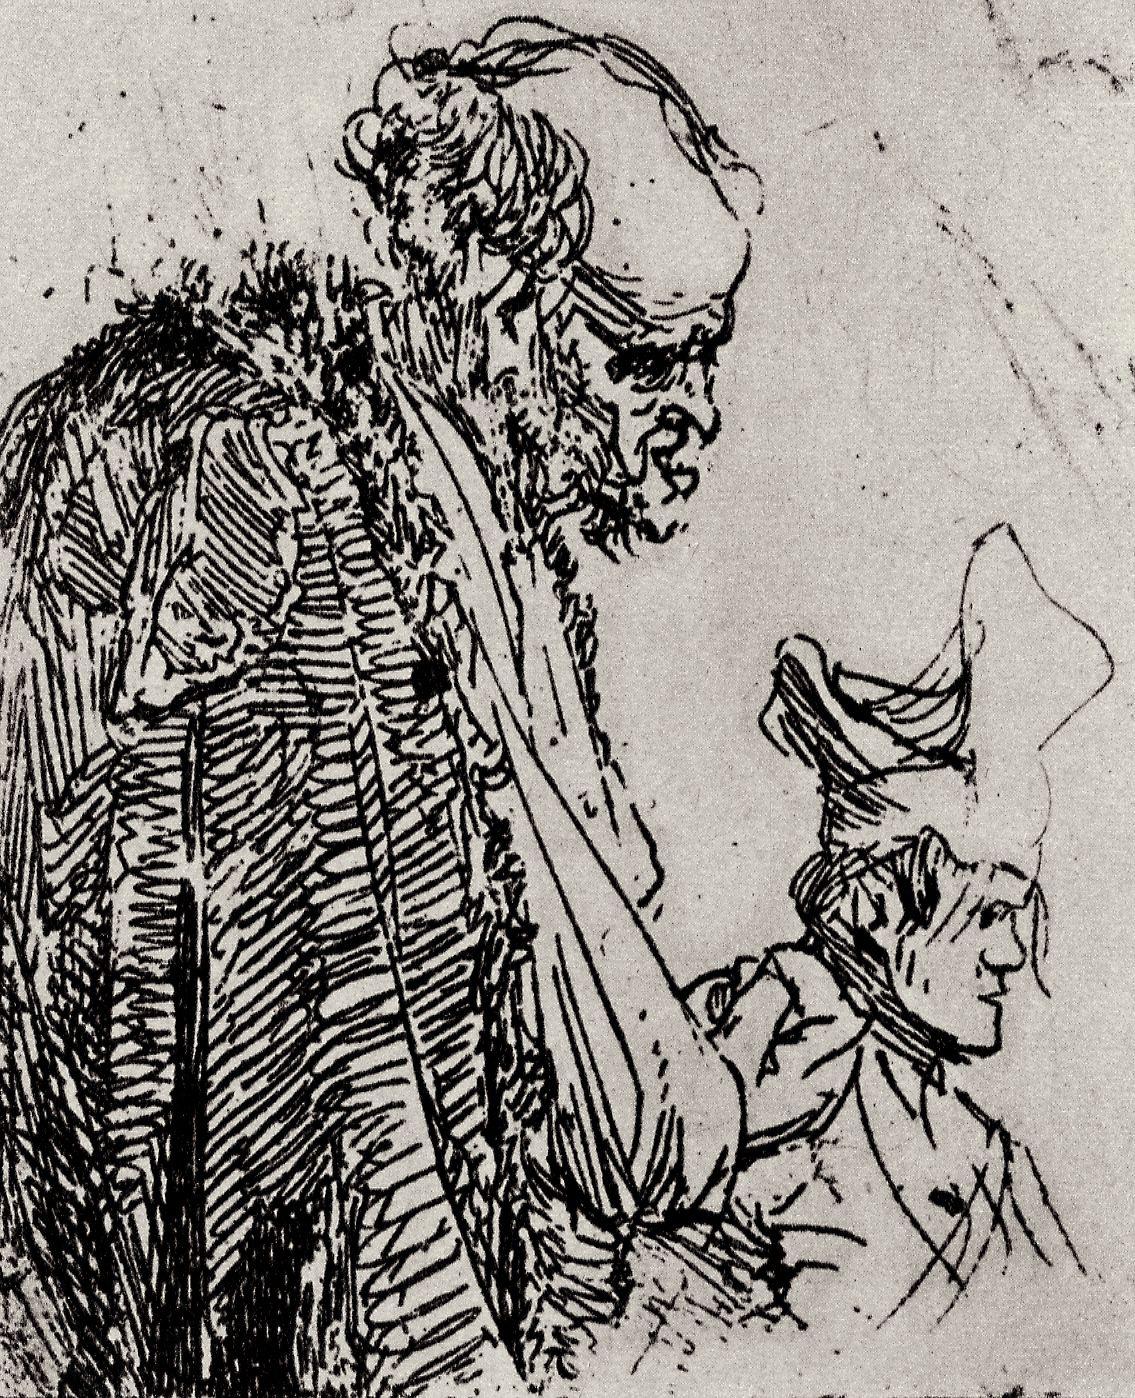 Rembrandt Harmenszoon van Rijn. Two sketches of beggars